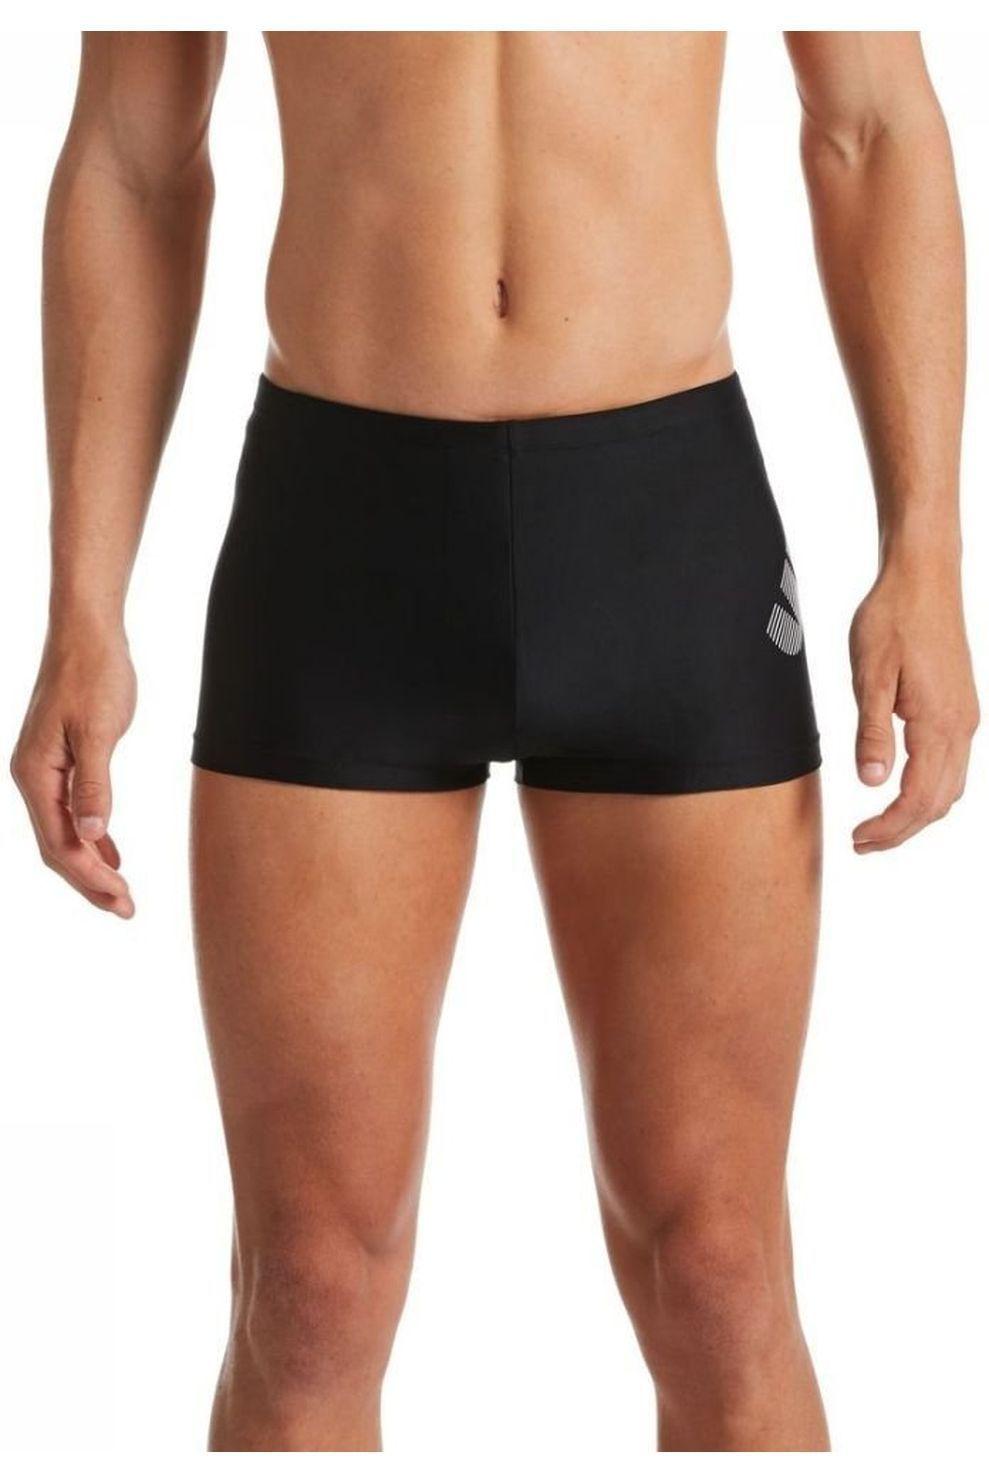 Nike Slip Square Leg voor heren - Zwart - Maten: S, M, L, XL